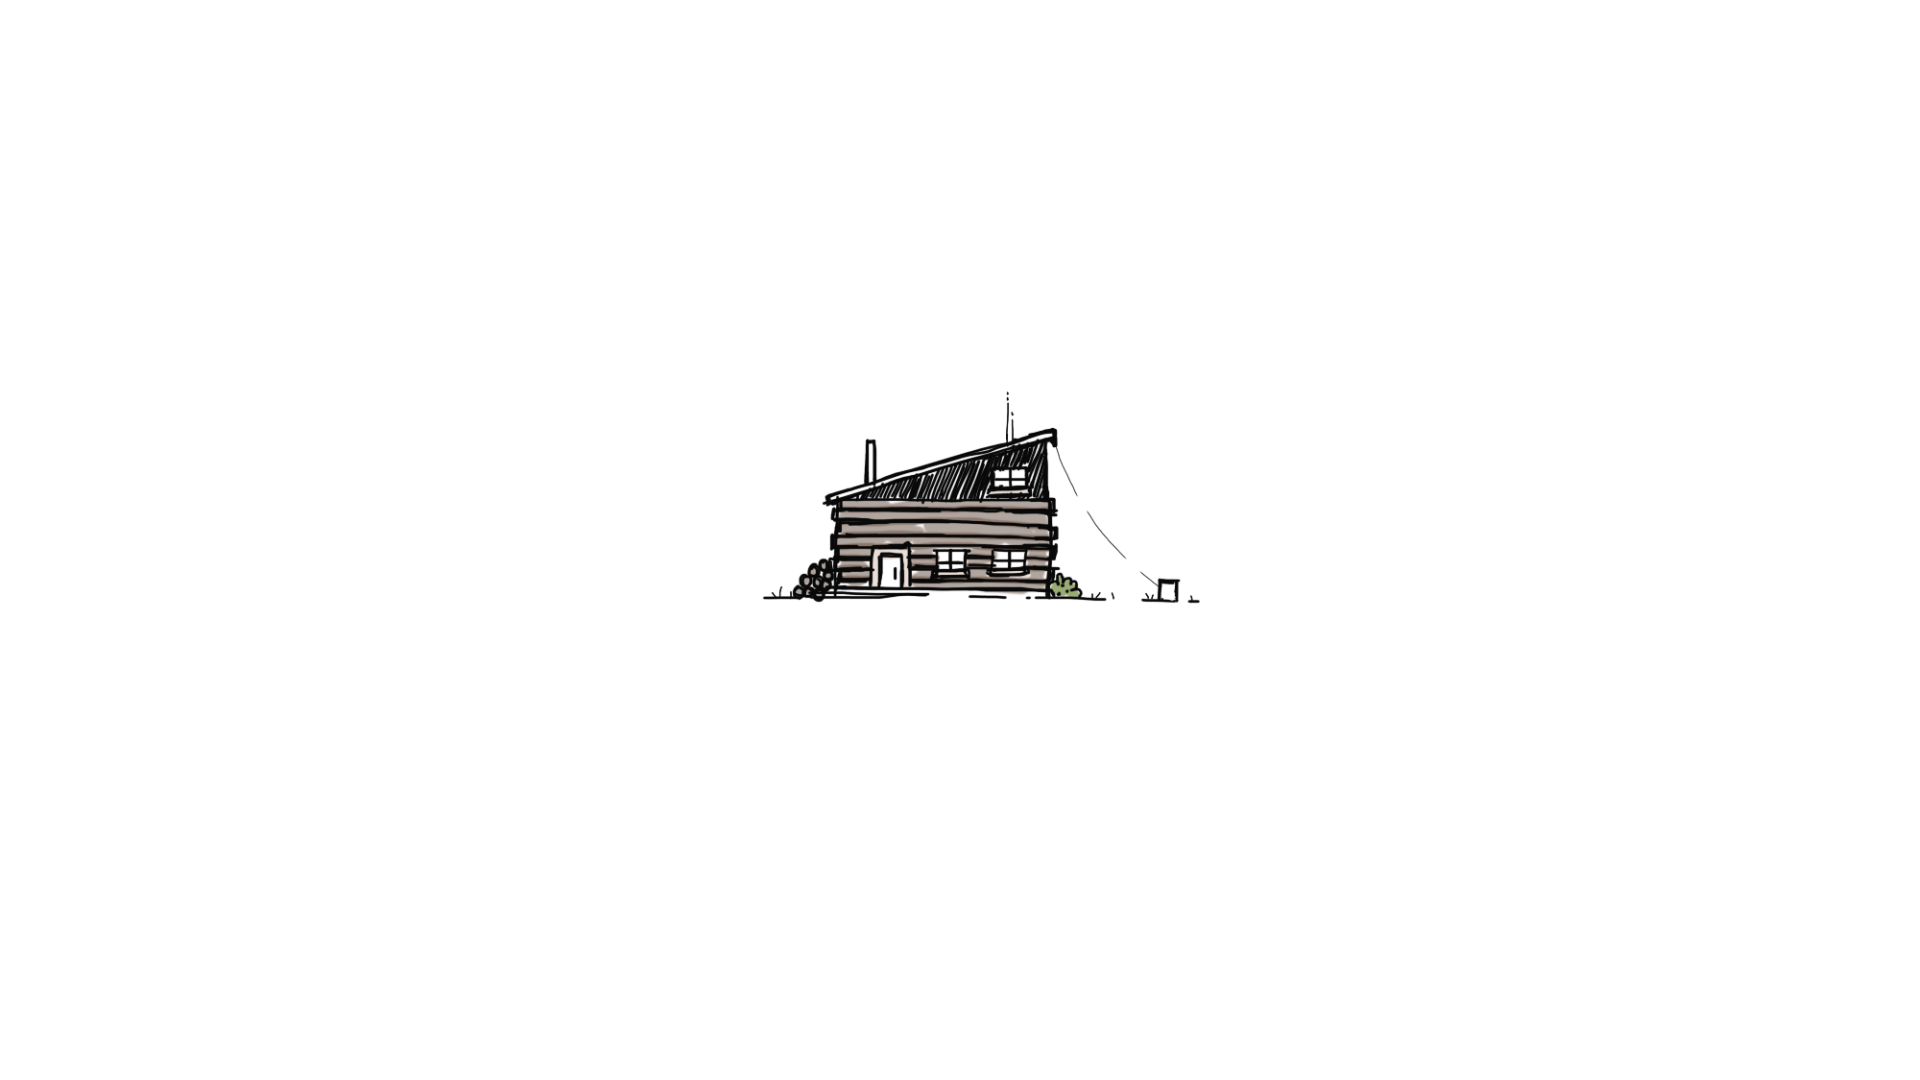 cabin_sketch.png